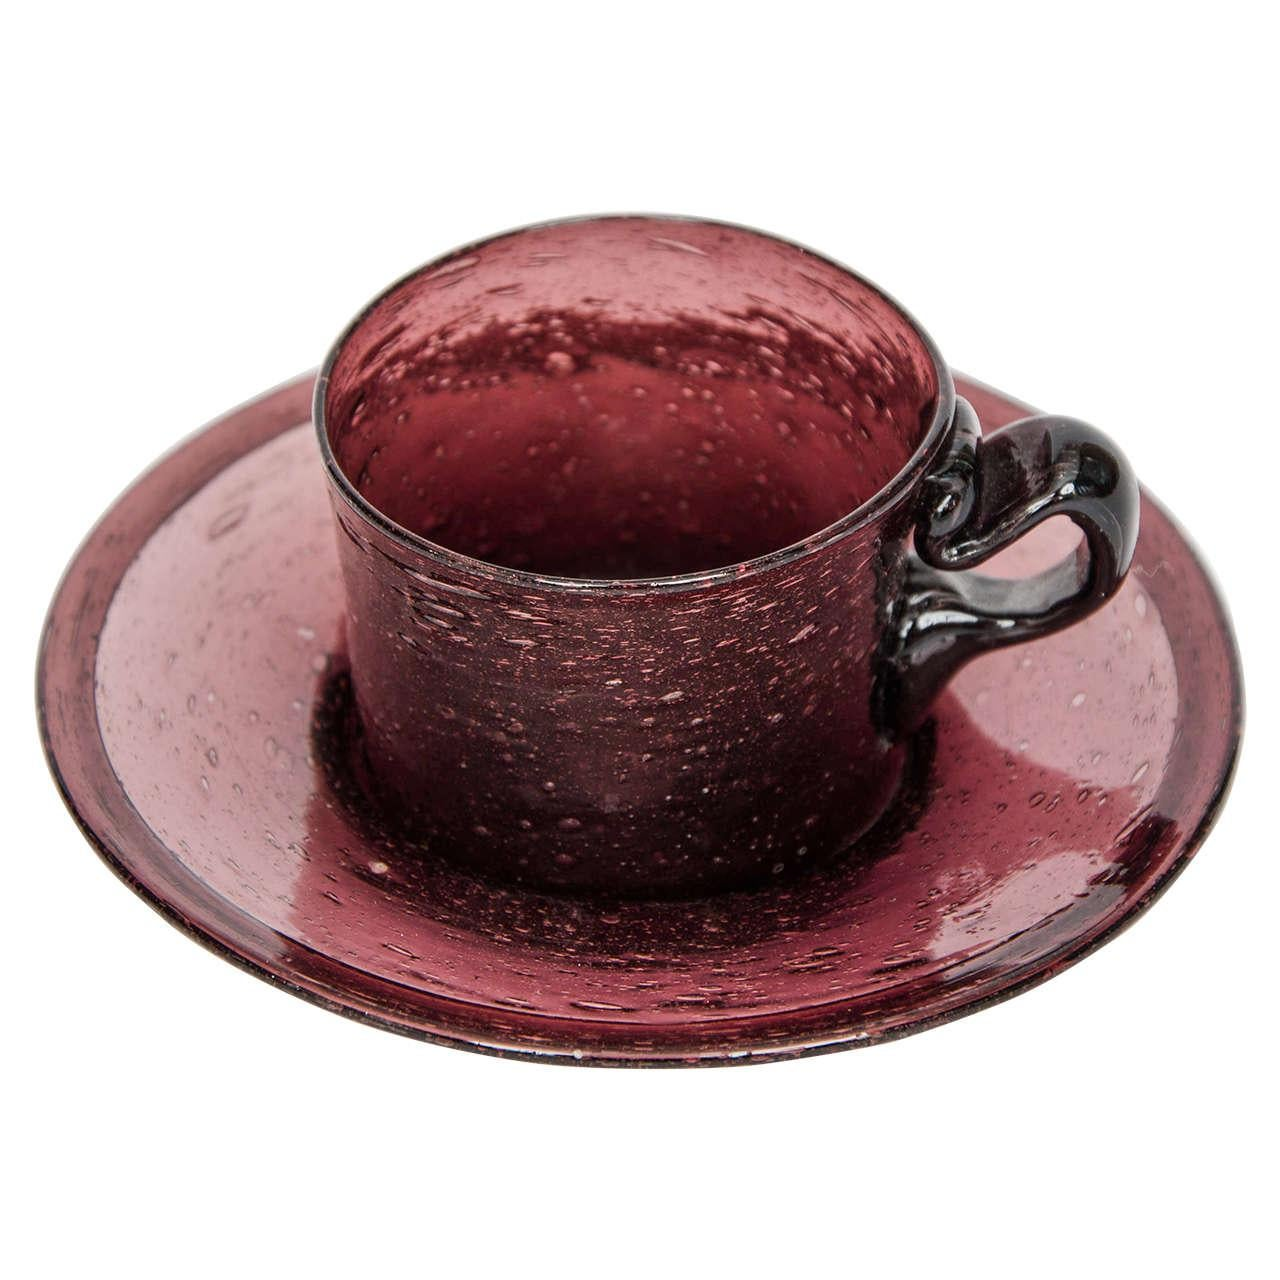 Rare Georgian Amethyst Glass Cup and Saucer Hand-Blown, circa 1800